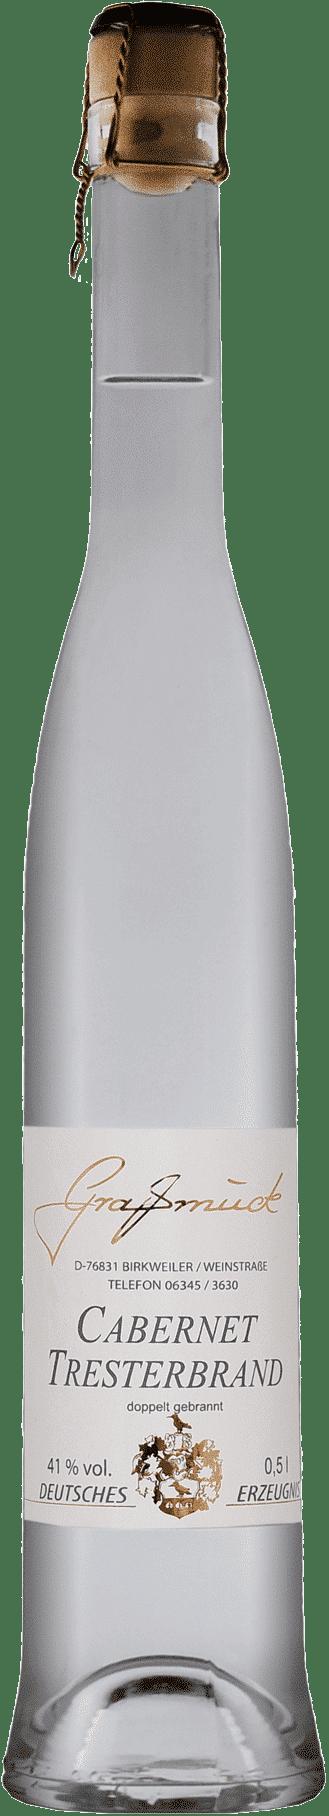 Weingut Ludwig Graßmück, Simon Graßmück, Cabernet Tresterbrand